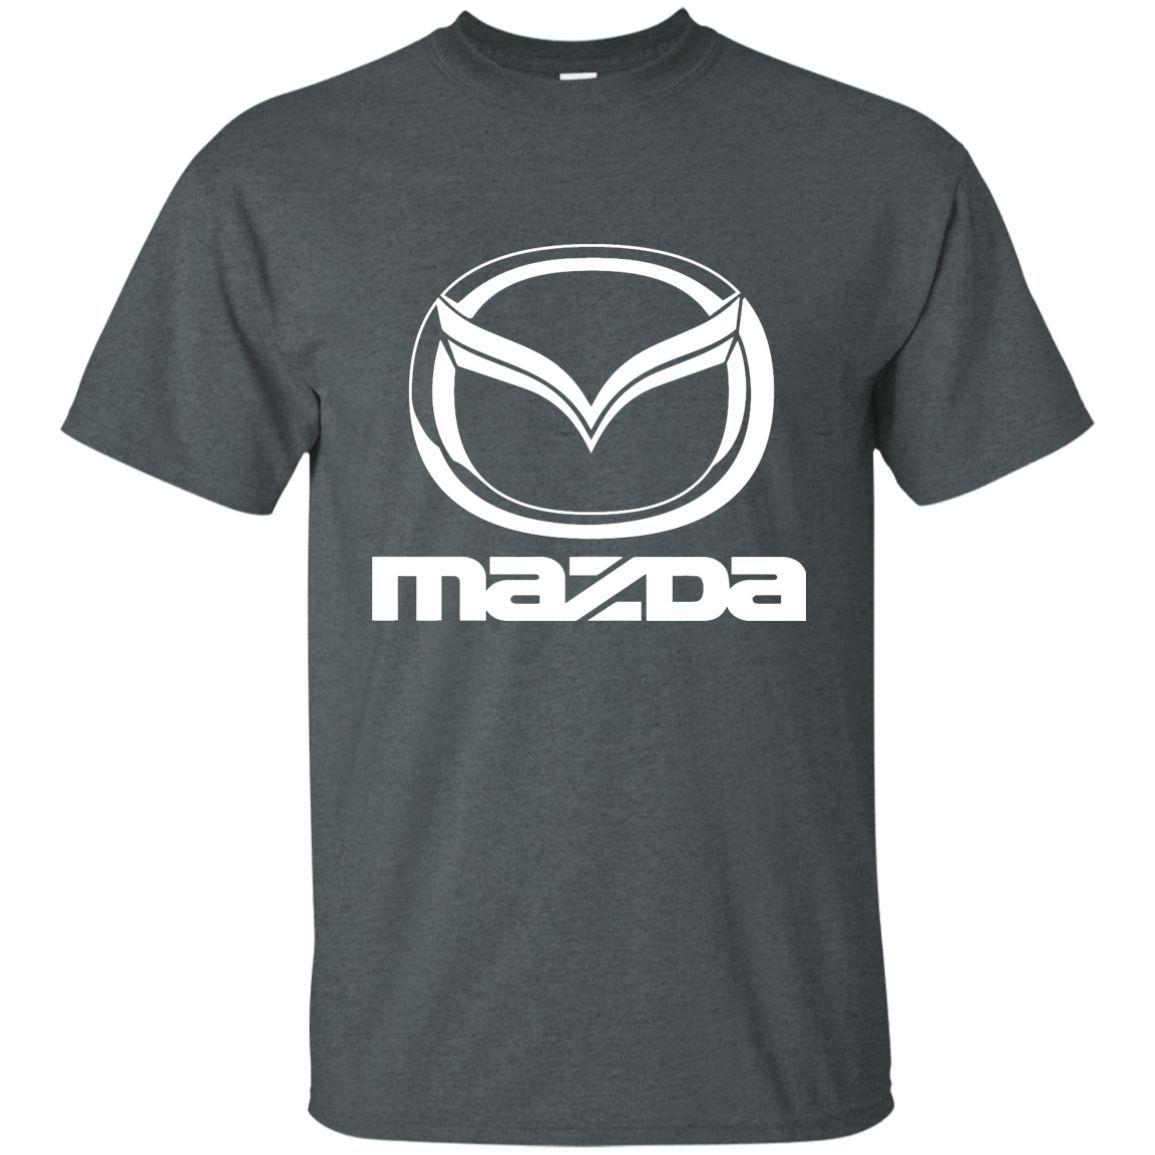 Mazda G200 Gildan Ultra Cotton T-Shirt